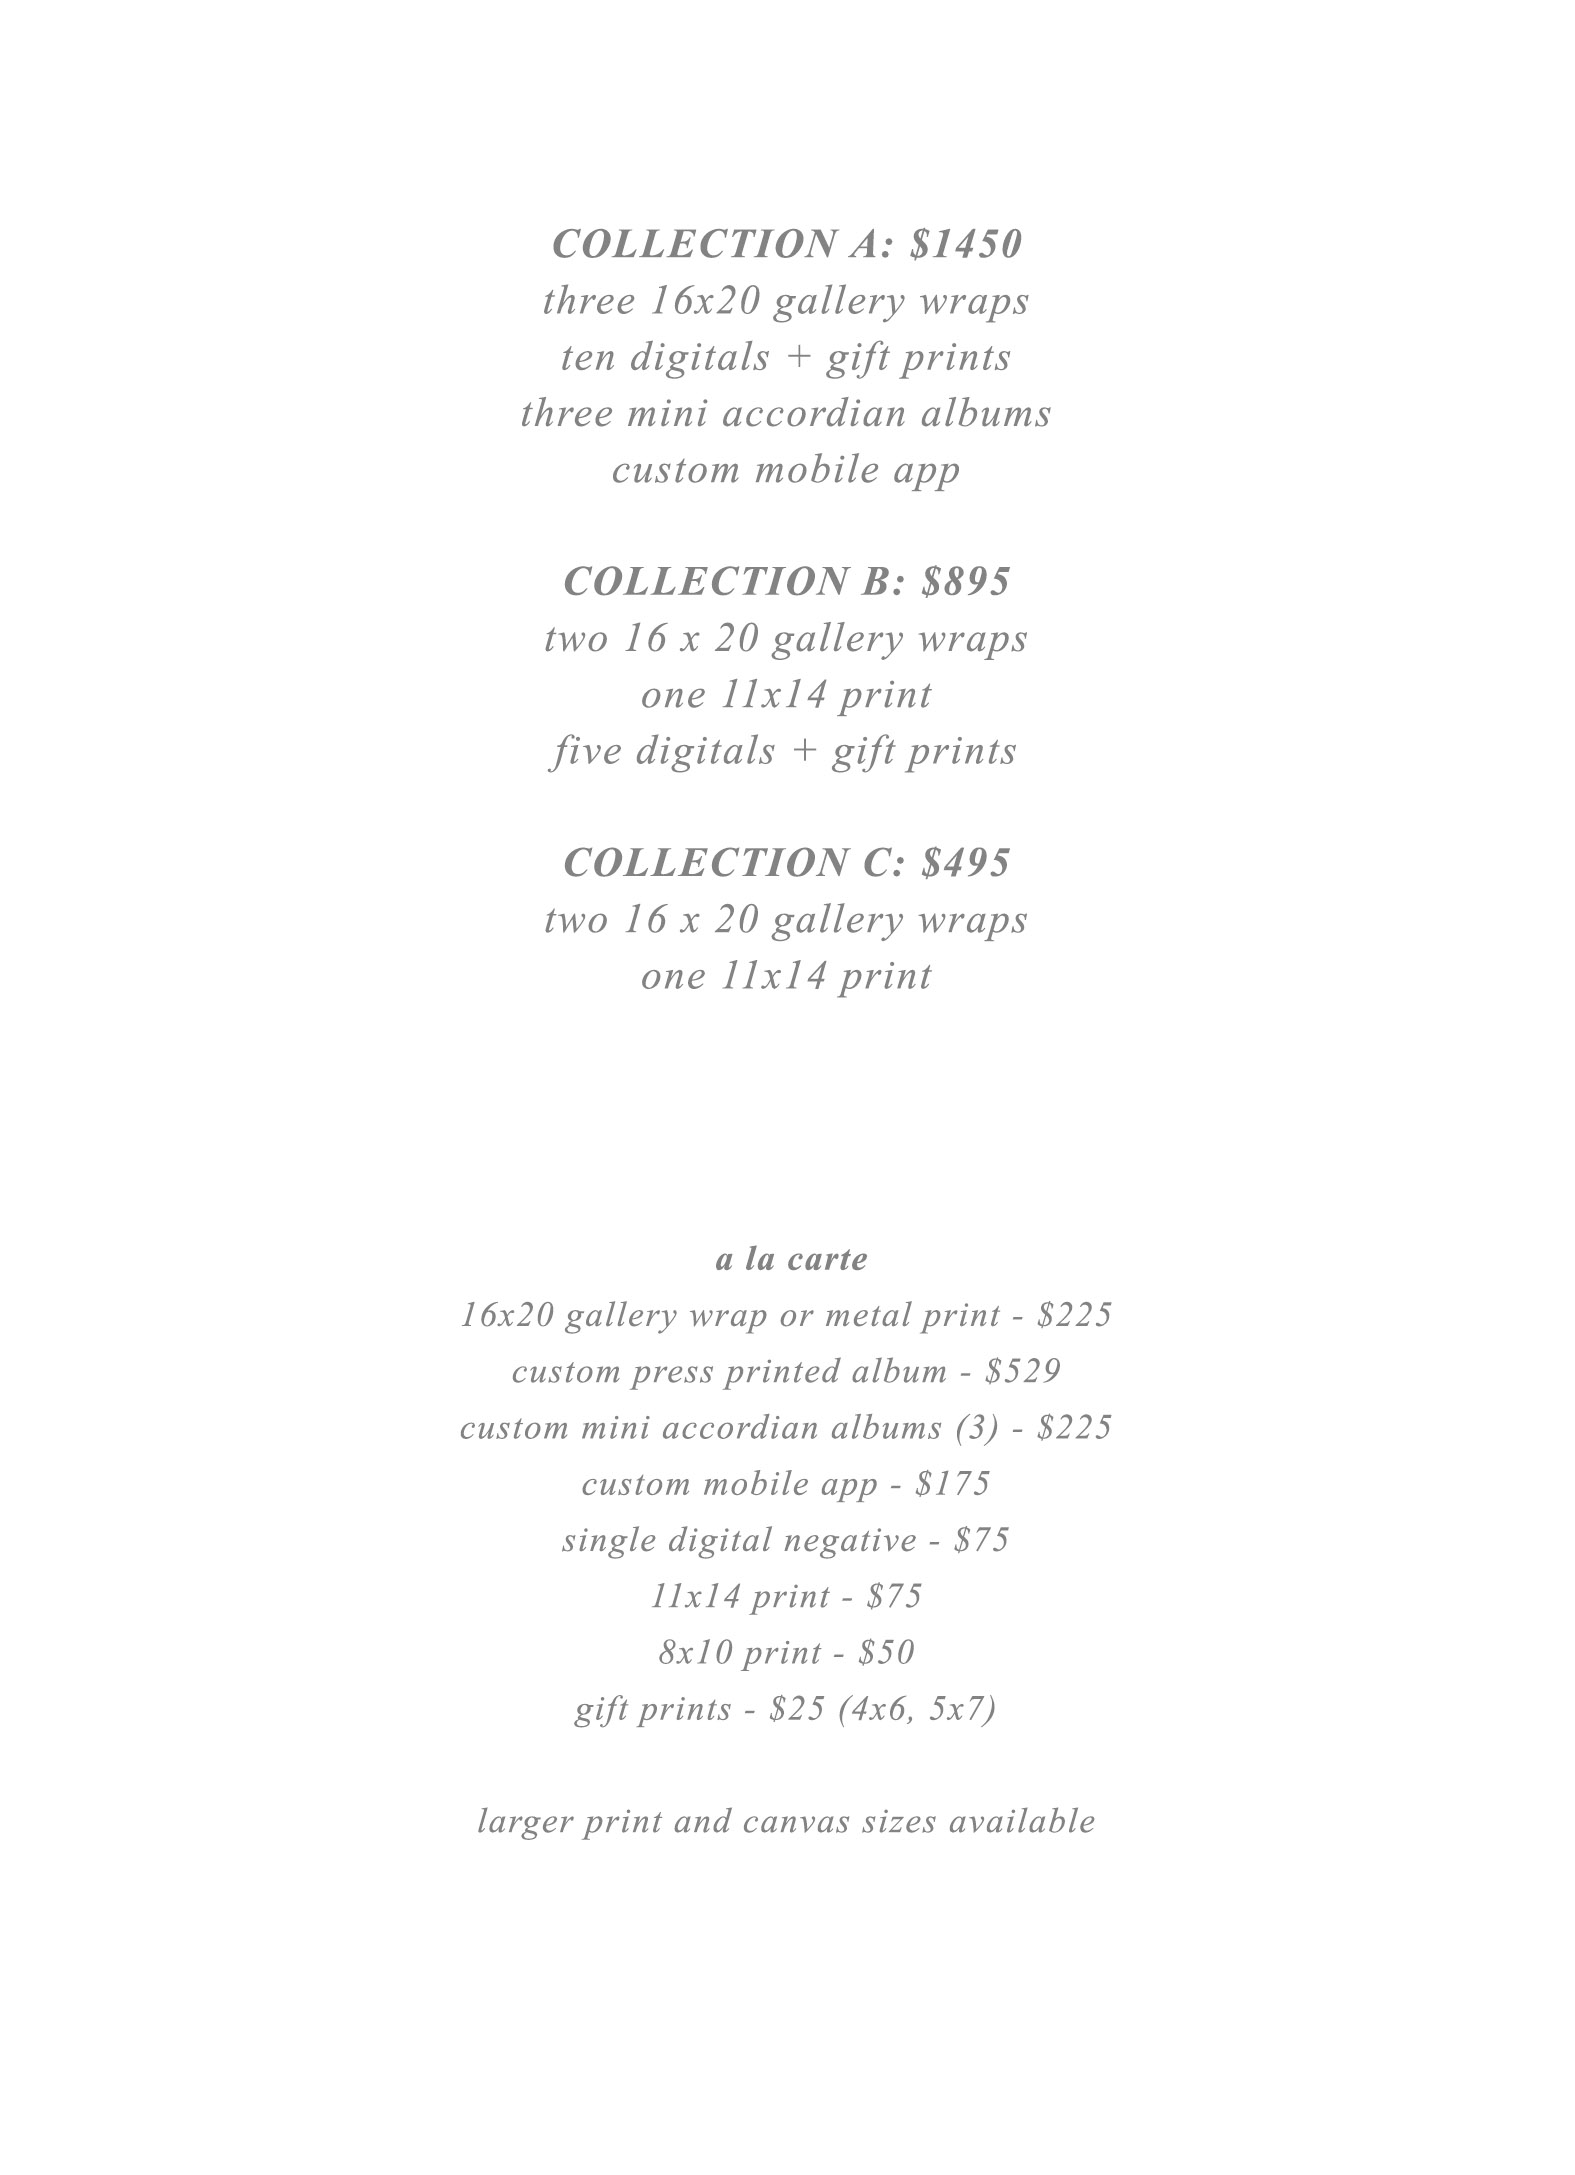 tara_romasanta_2016_collection_pricing.jpg